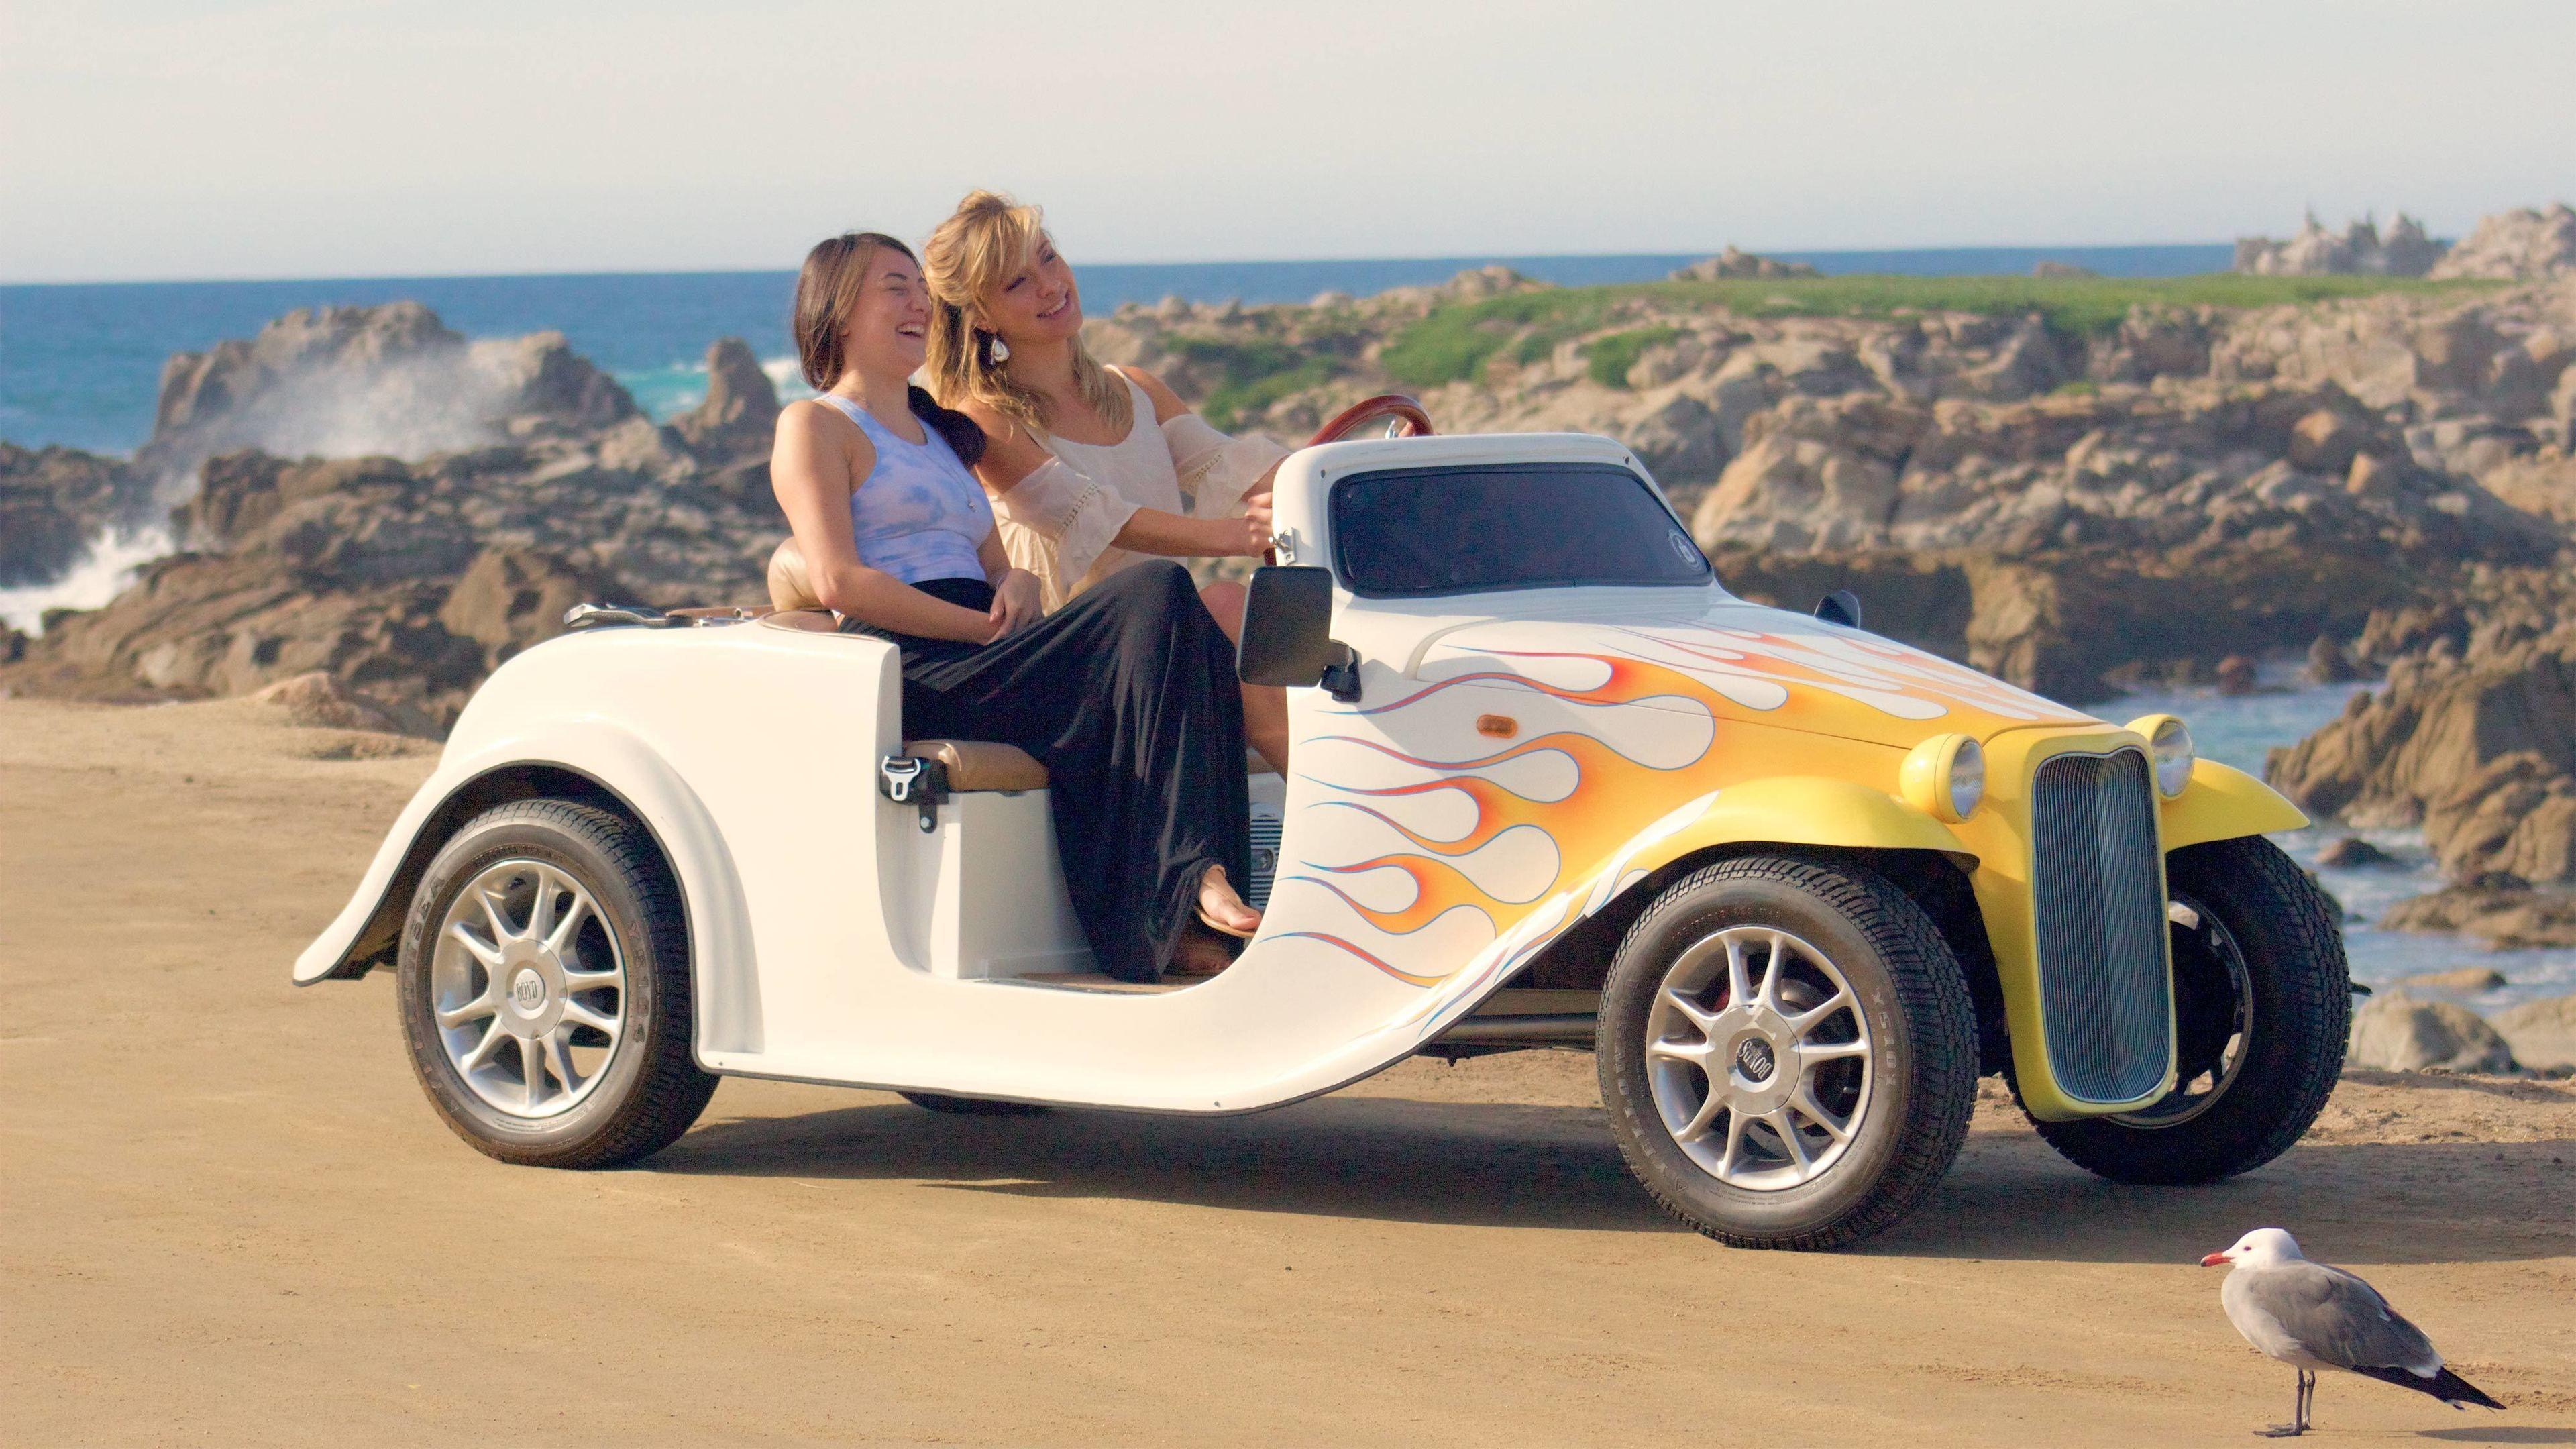 Self-Drive Monterey Bay & Pebble Beach Tour in an Electric Convertible